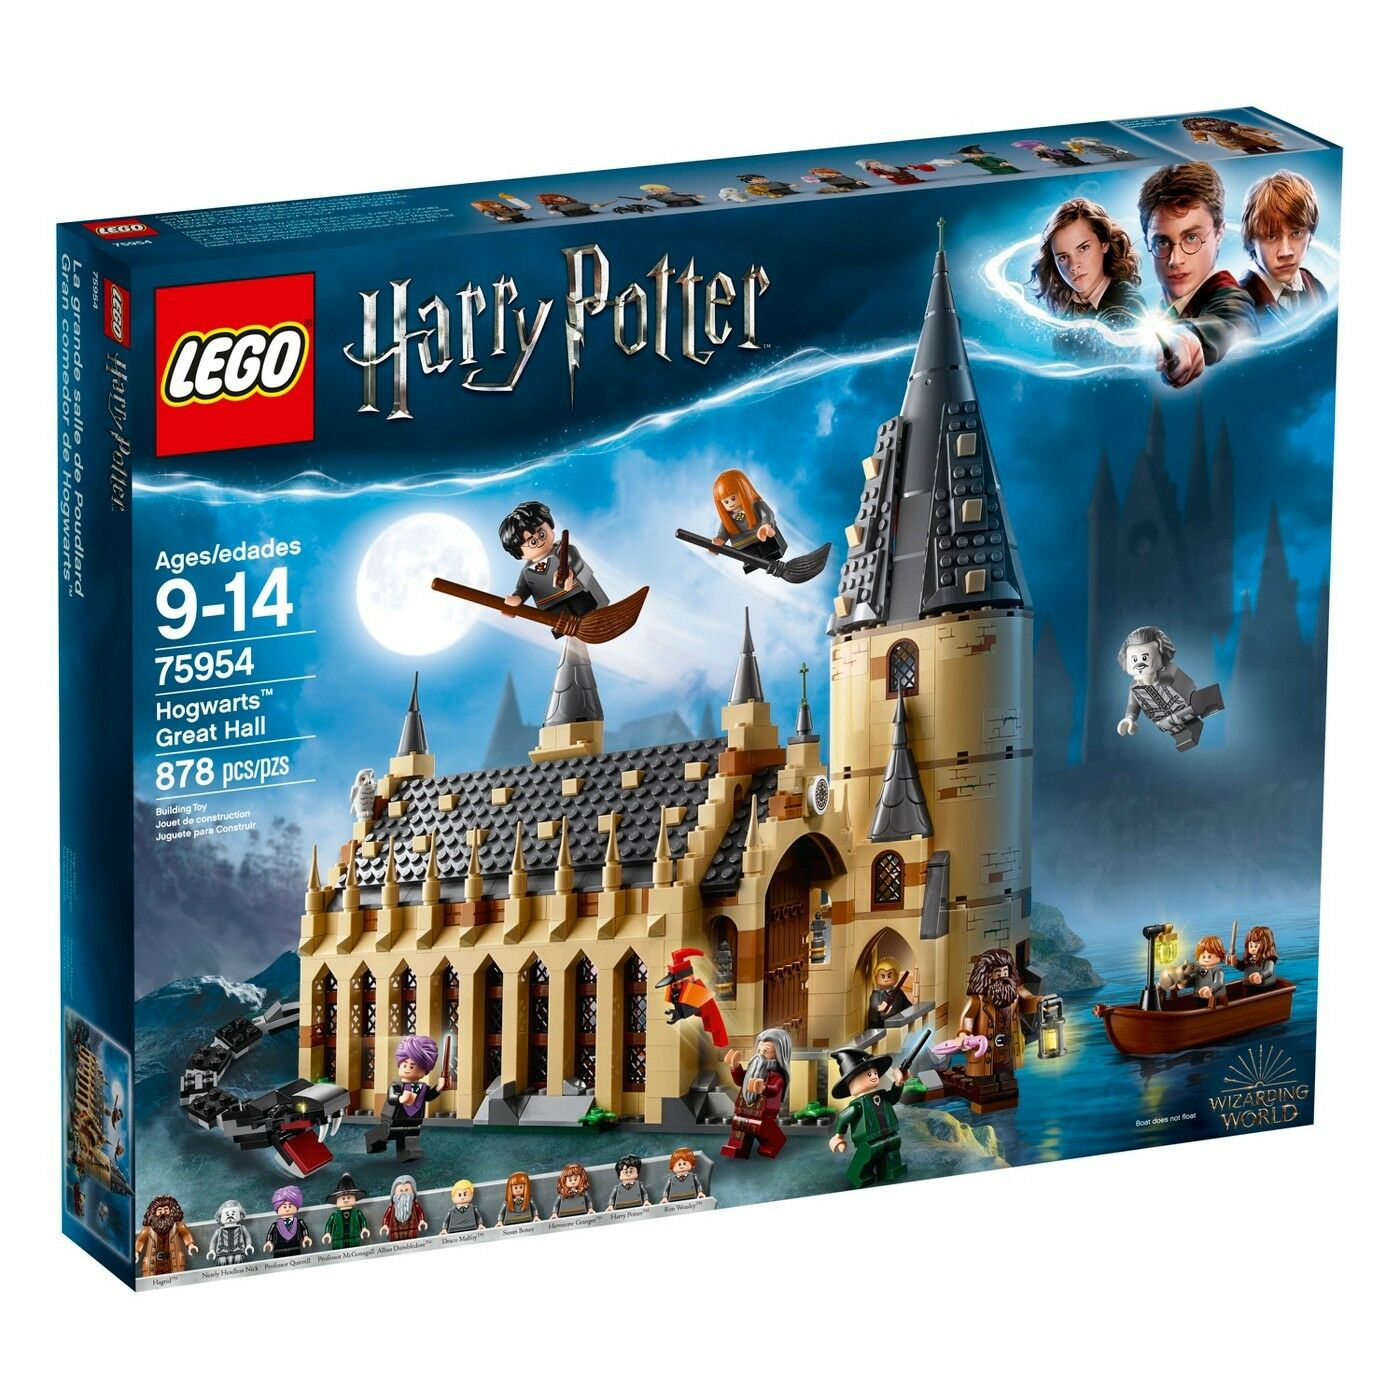 LEGO Harry Potter 75954 Wizarding World Hogwarts Great Hall Nuovo